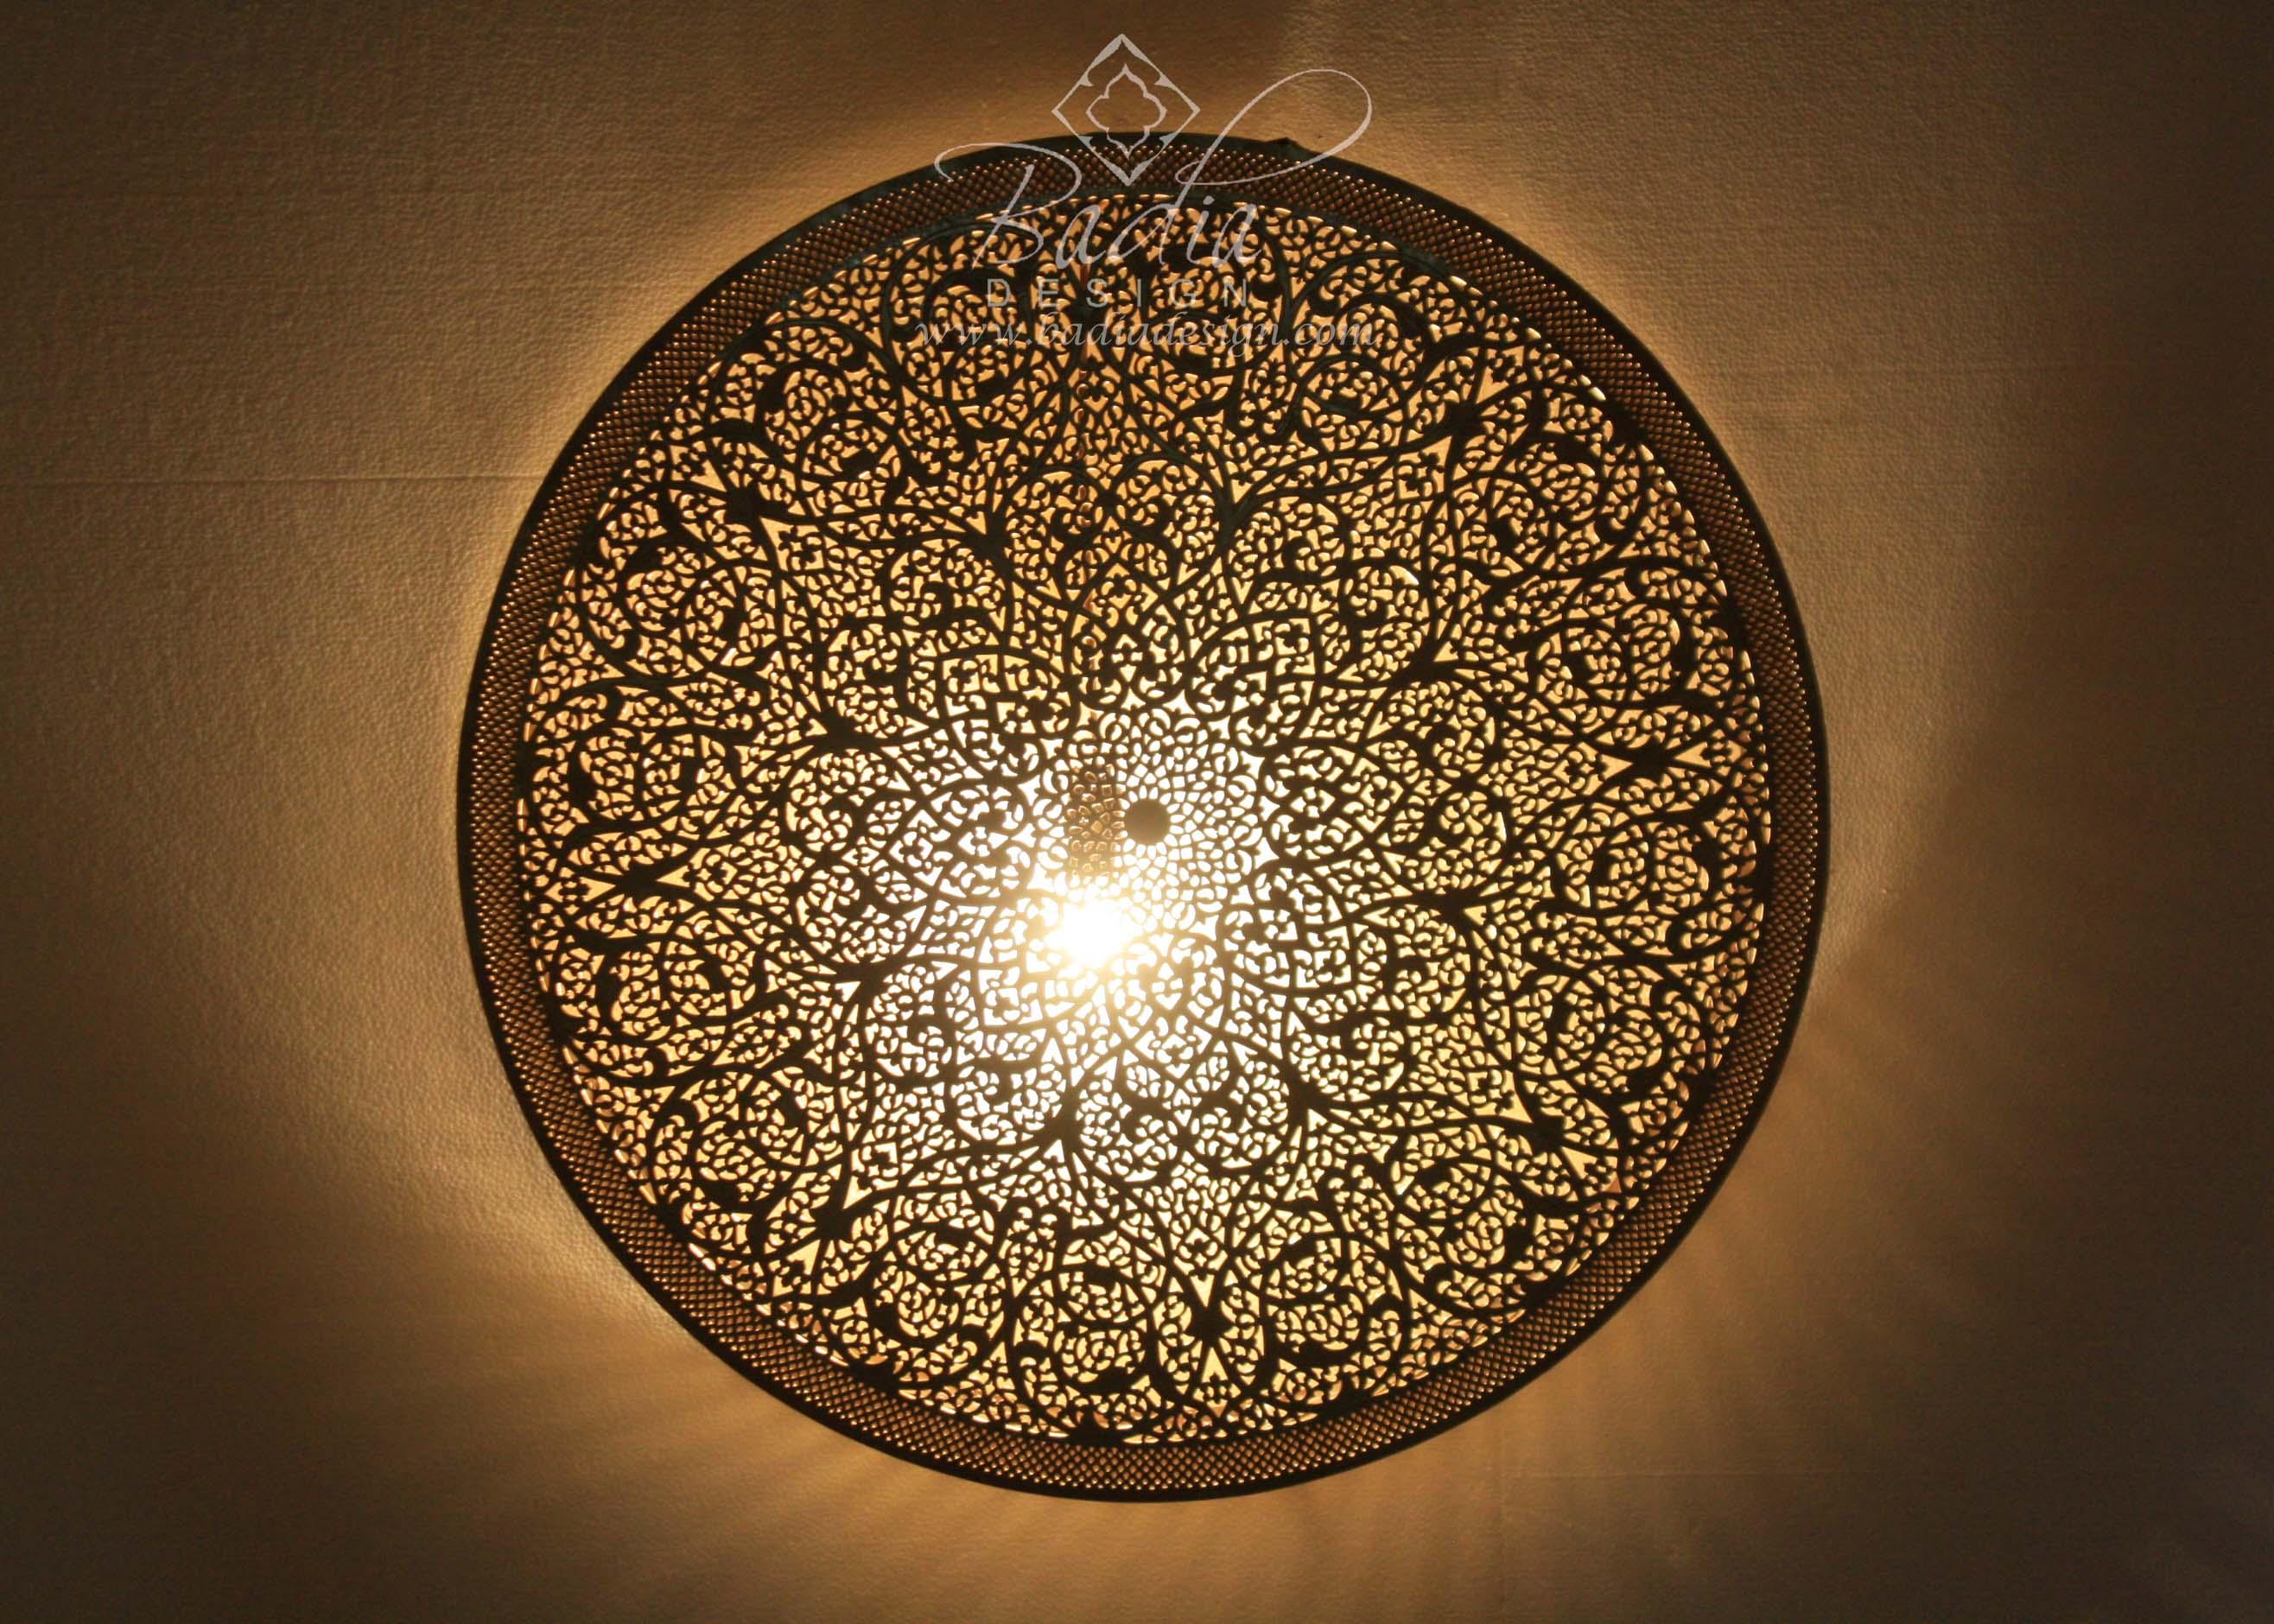 moroccan-intricately-designed-brass-wall-sconce-wl219-3.jpg